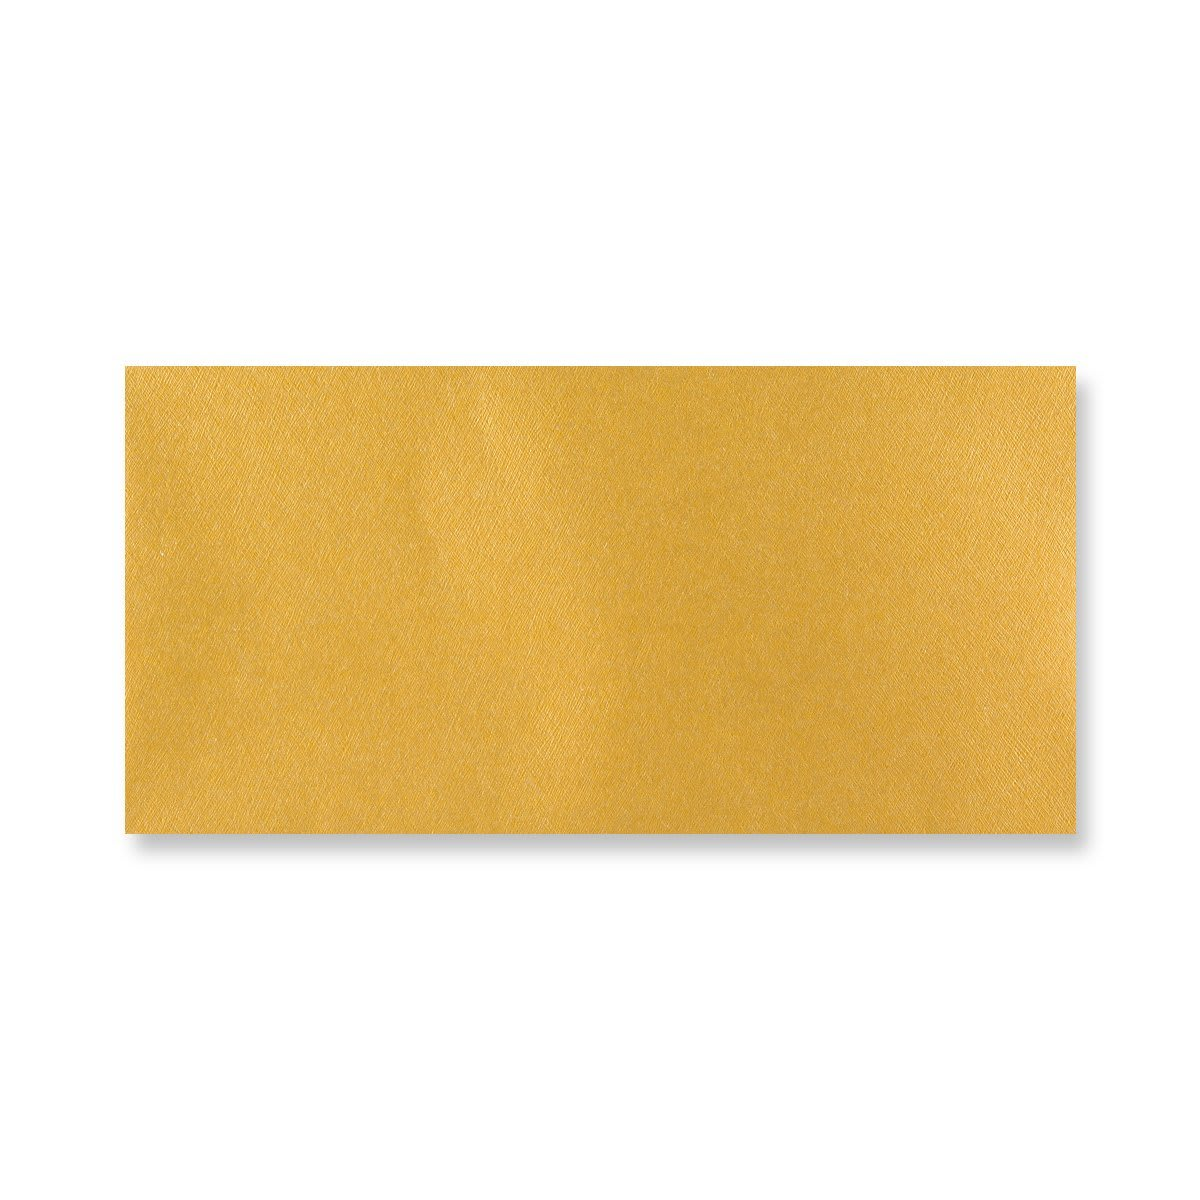 DL GOLD BUTTERFLY ENVELOPES